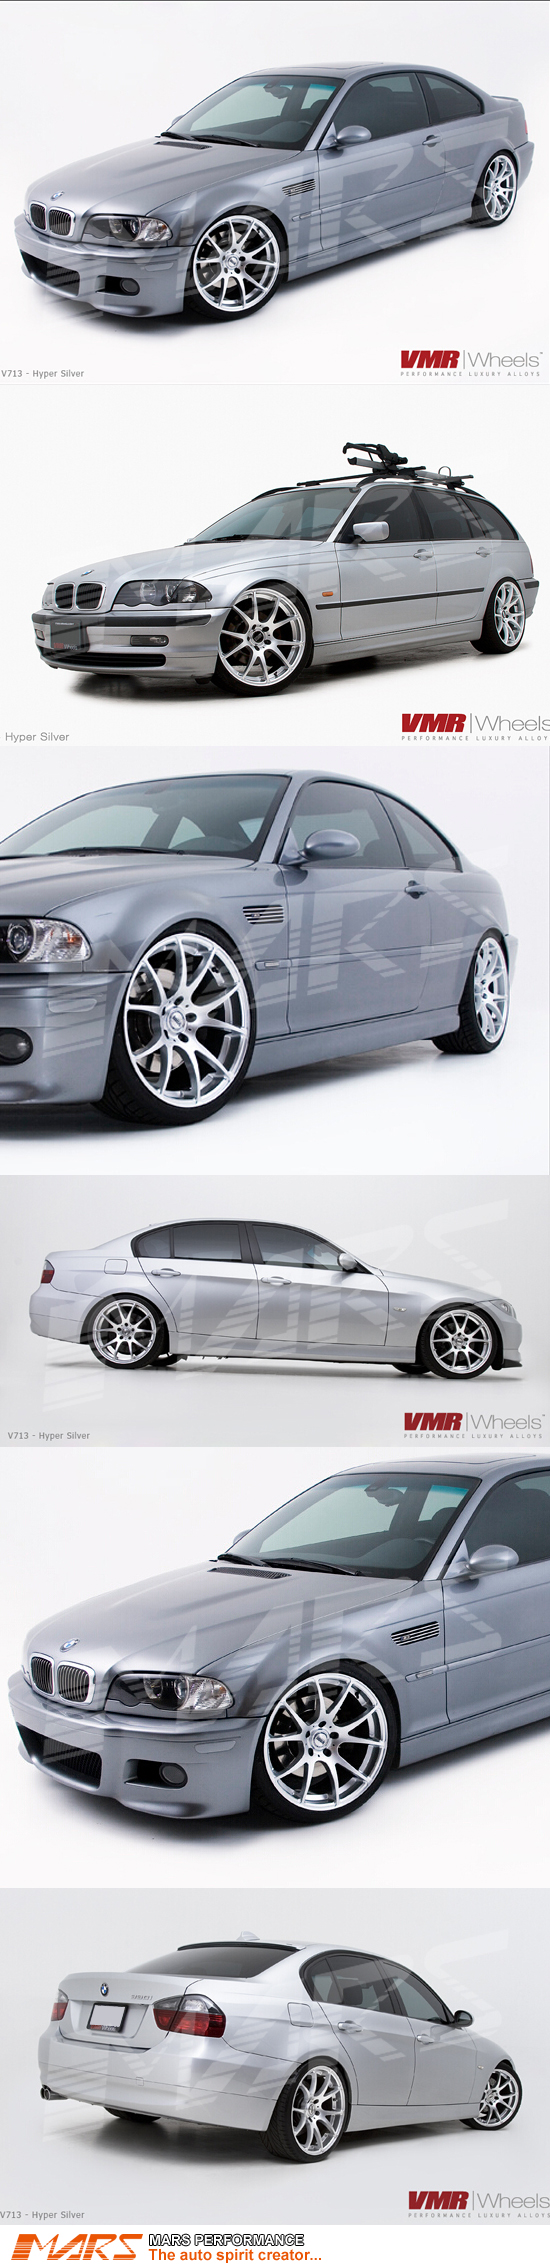 Vmr V713 4 X 19 Inch Hype Silver Concave Alloy Wheels Rims 5x120 Mars Performance